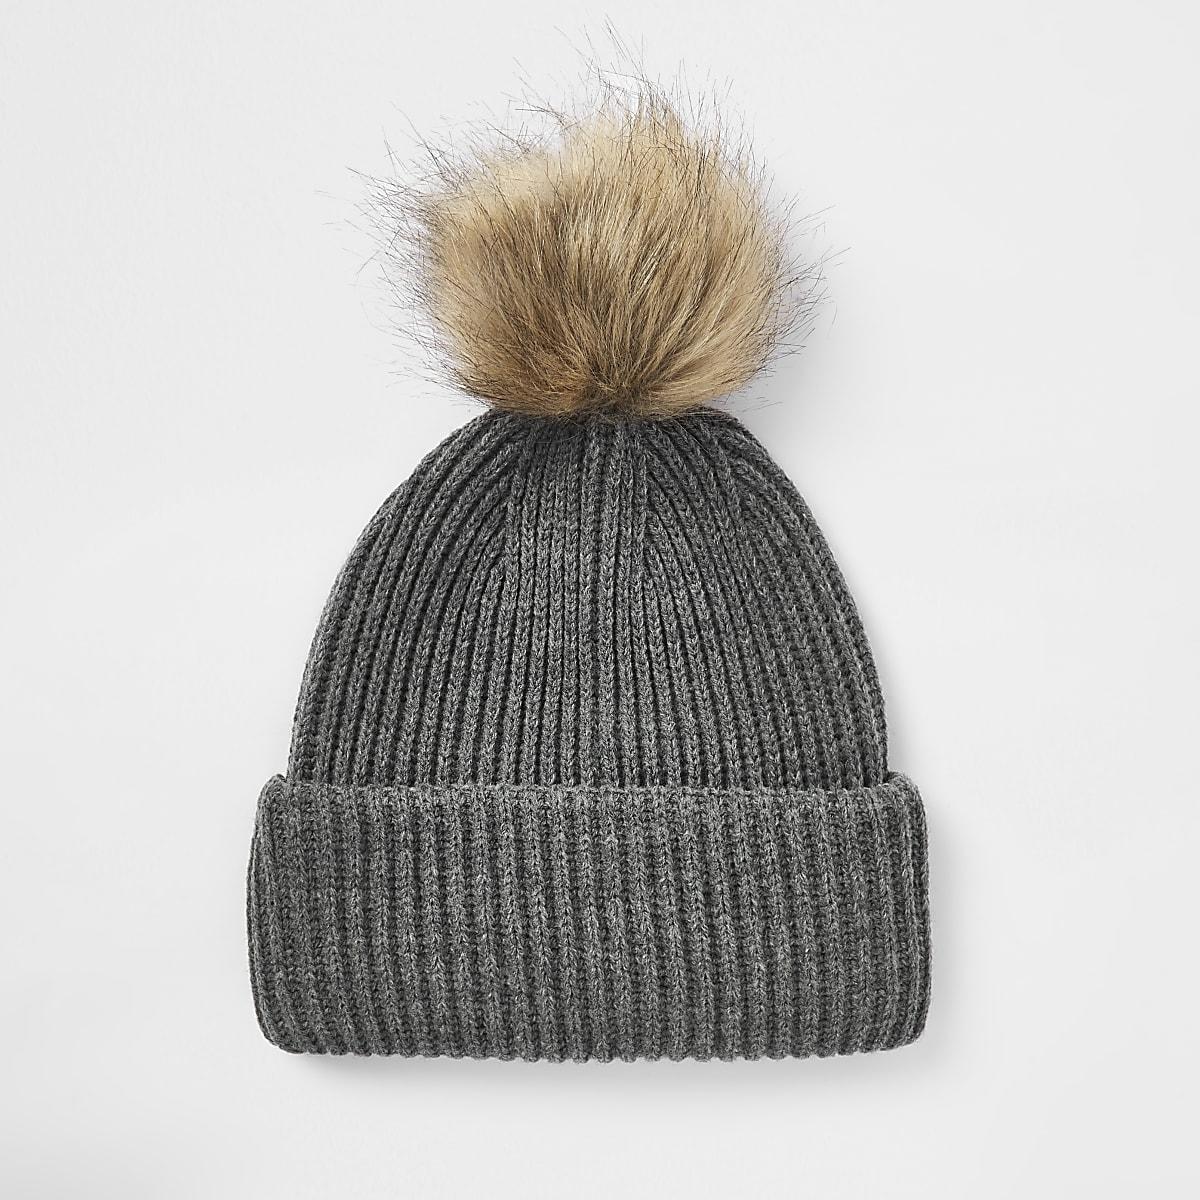 a6b914e7bdf Grey faux fur pom pom beanie hat - Hats   Caps - Accessories - men